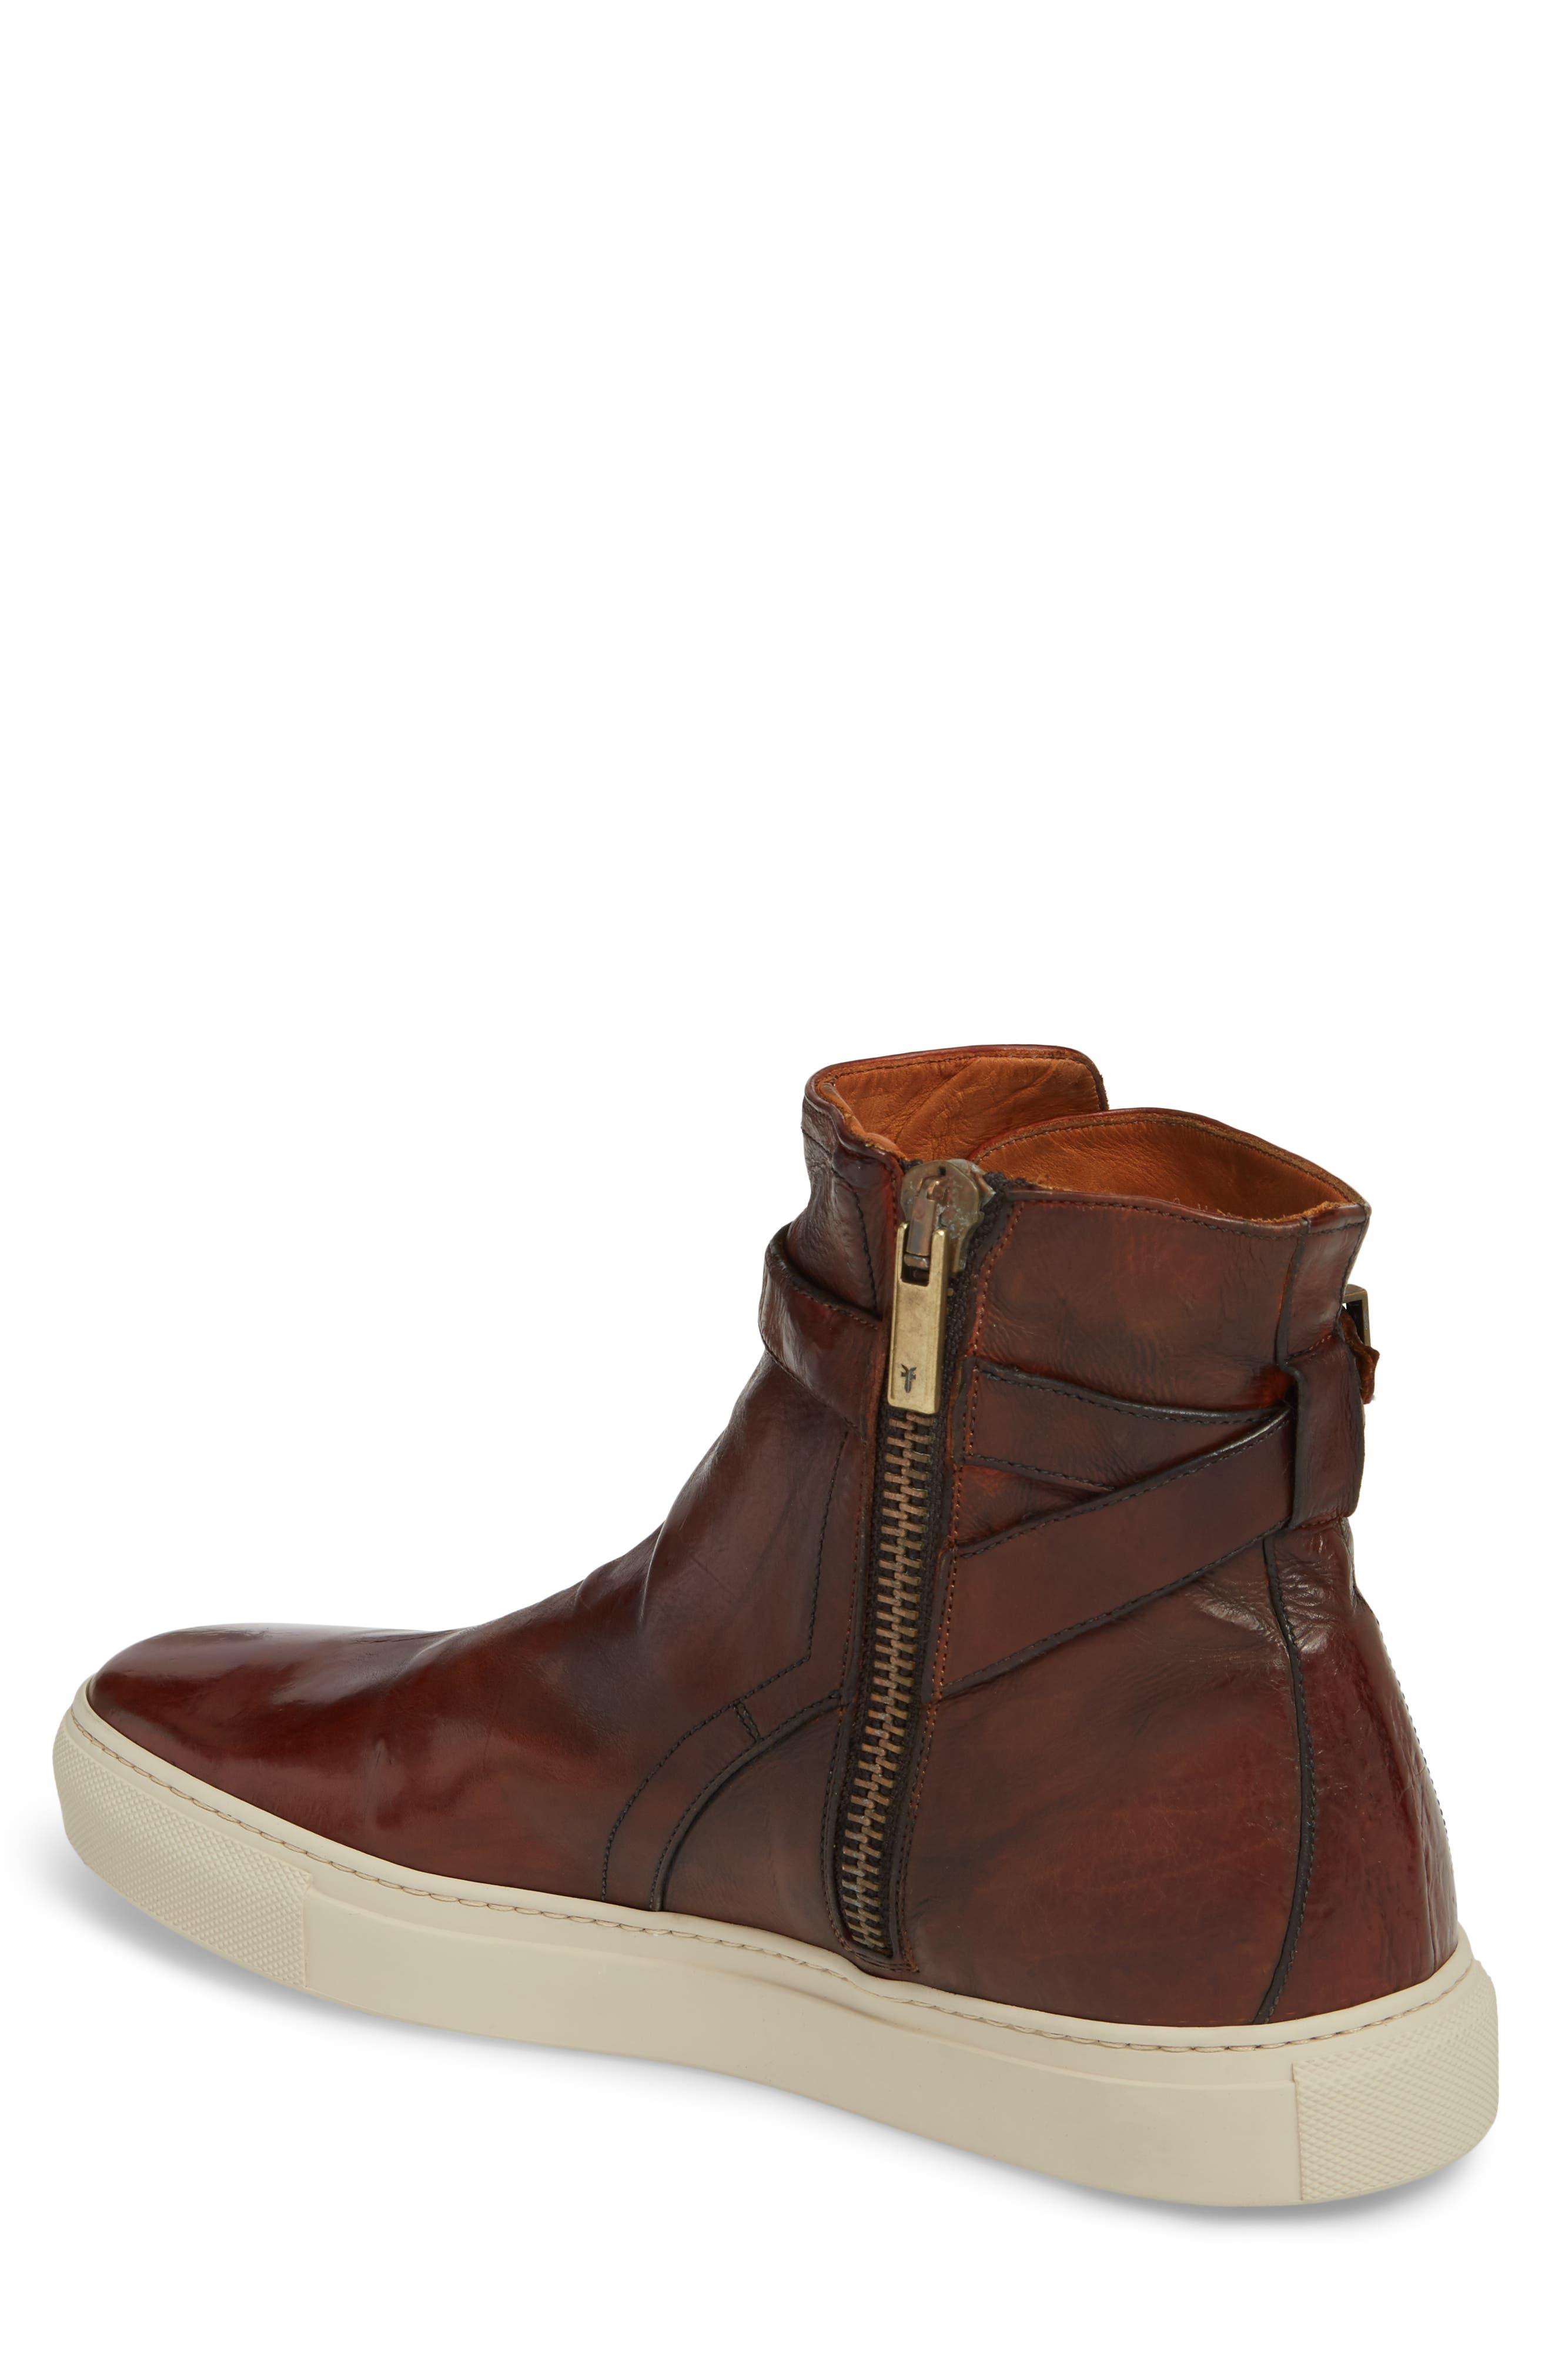 Owen Jodhpur High Top Sneaker,                             Alternate thumbnail 2, color,                             Redwood Leather